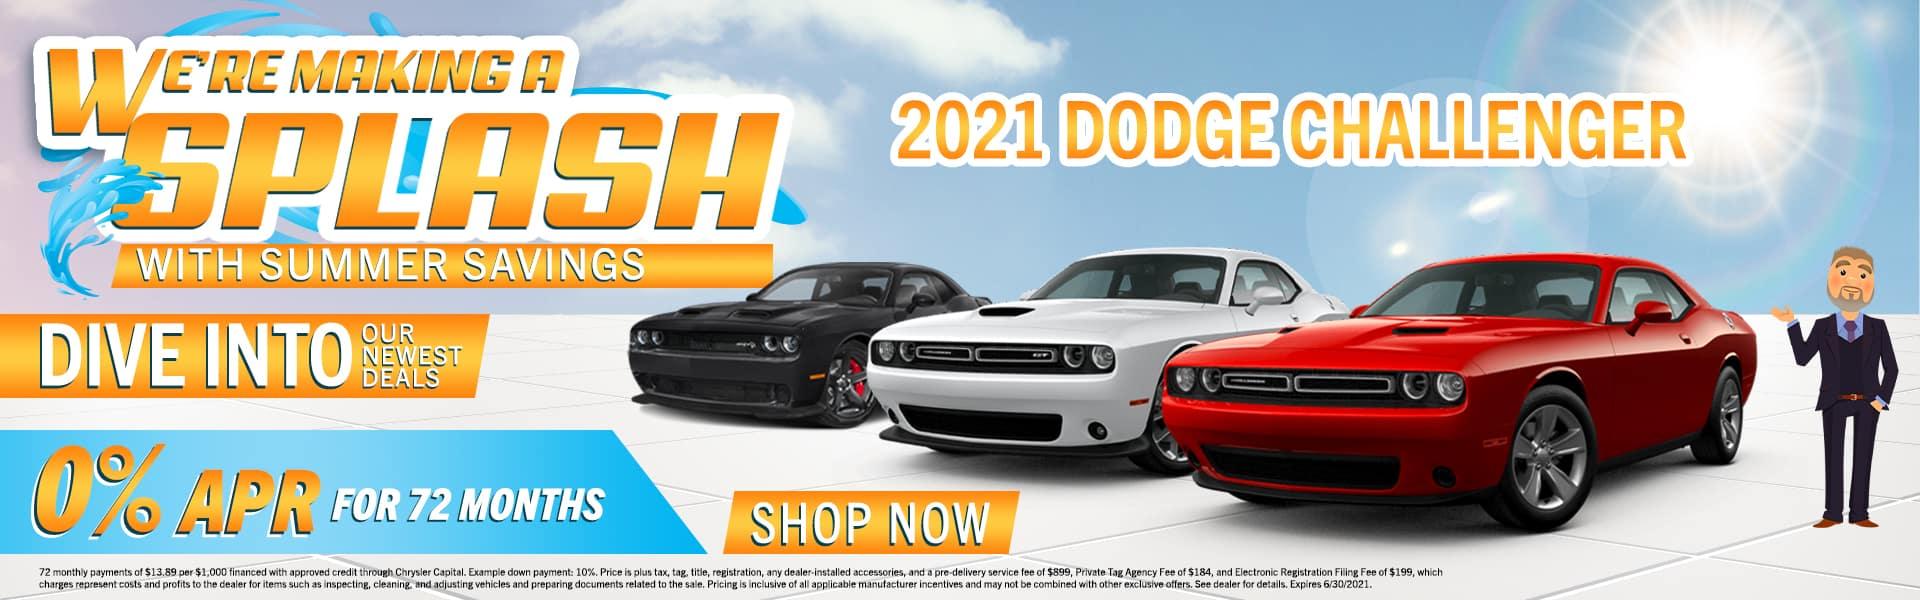 2021_Dodge_Challenger_[1]